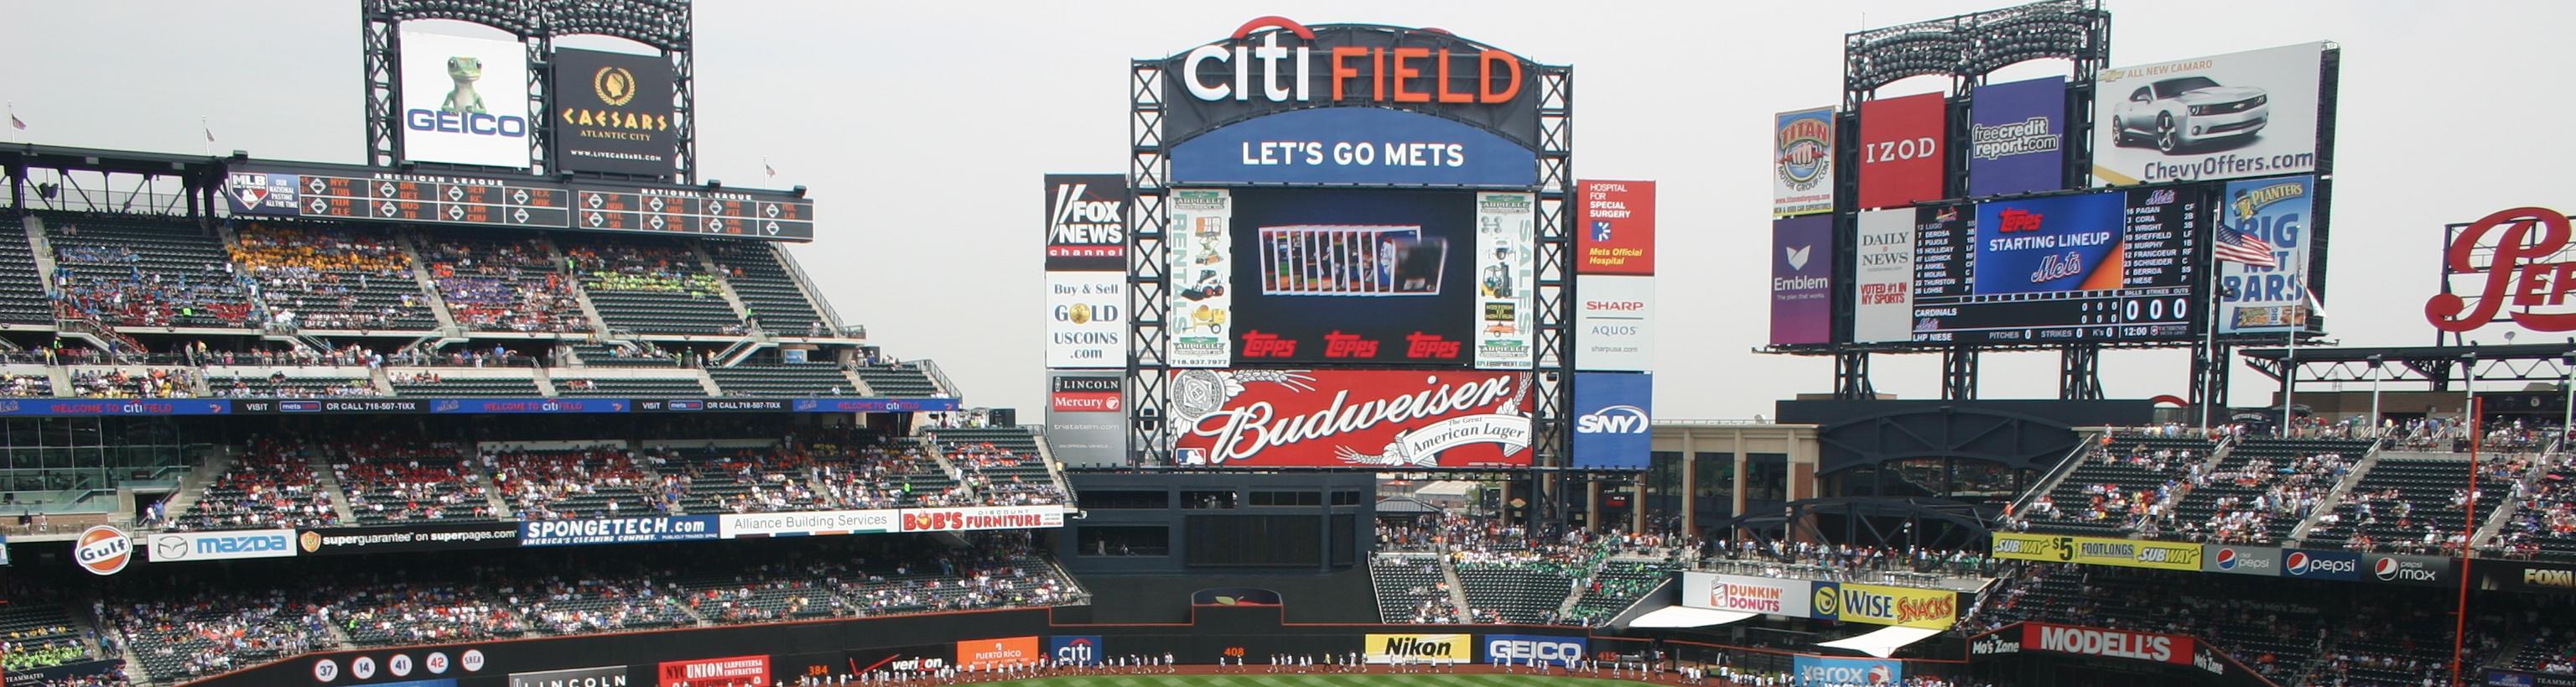 Citi Field,new york trips,baseball stadium tours,baseballtrips